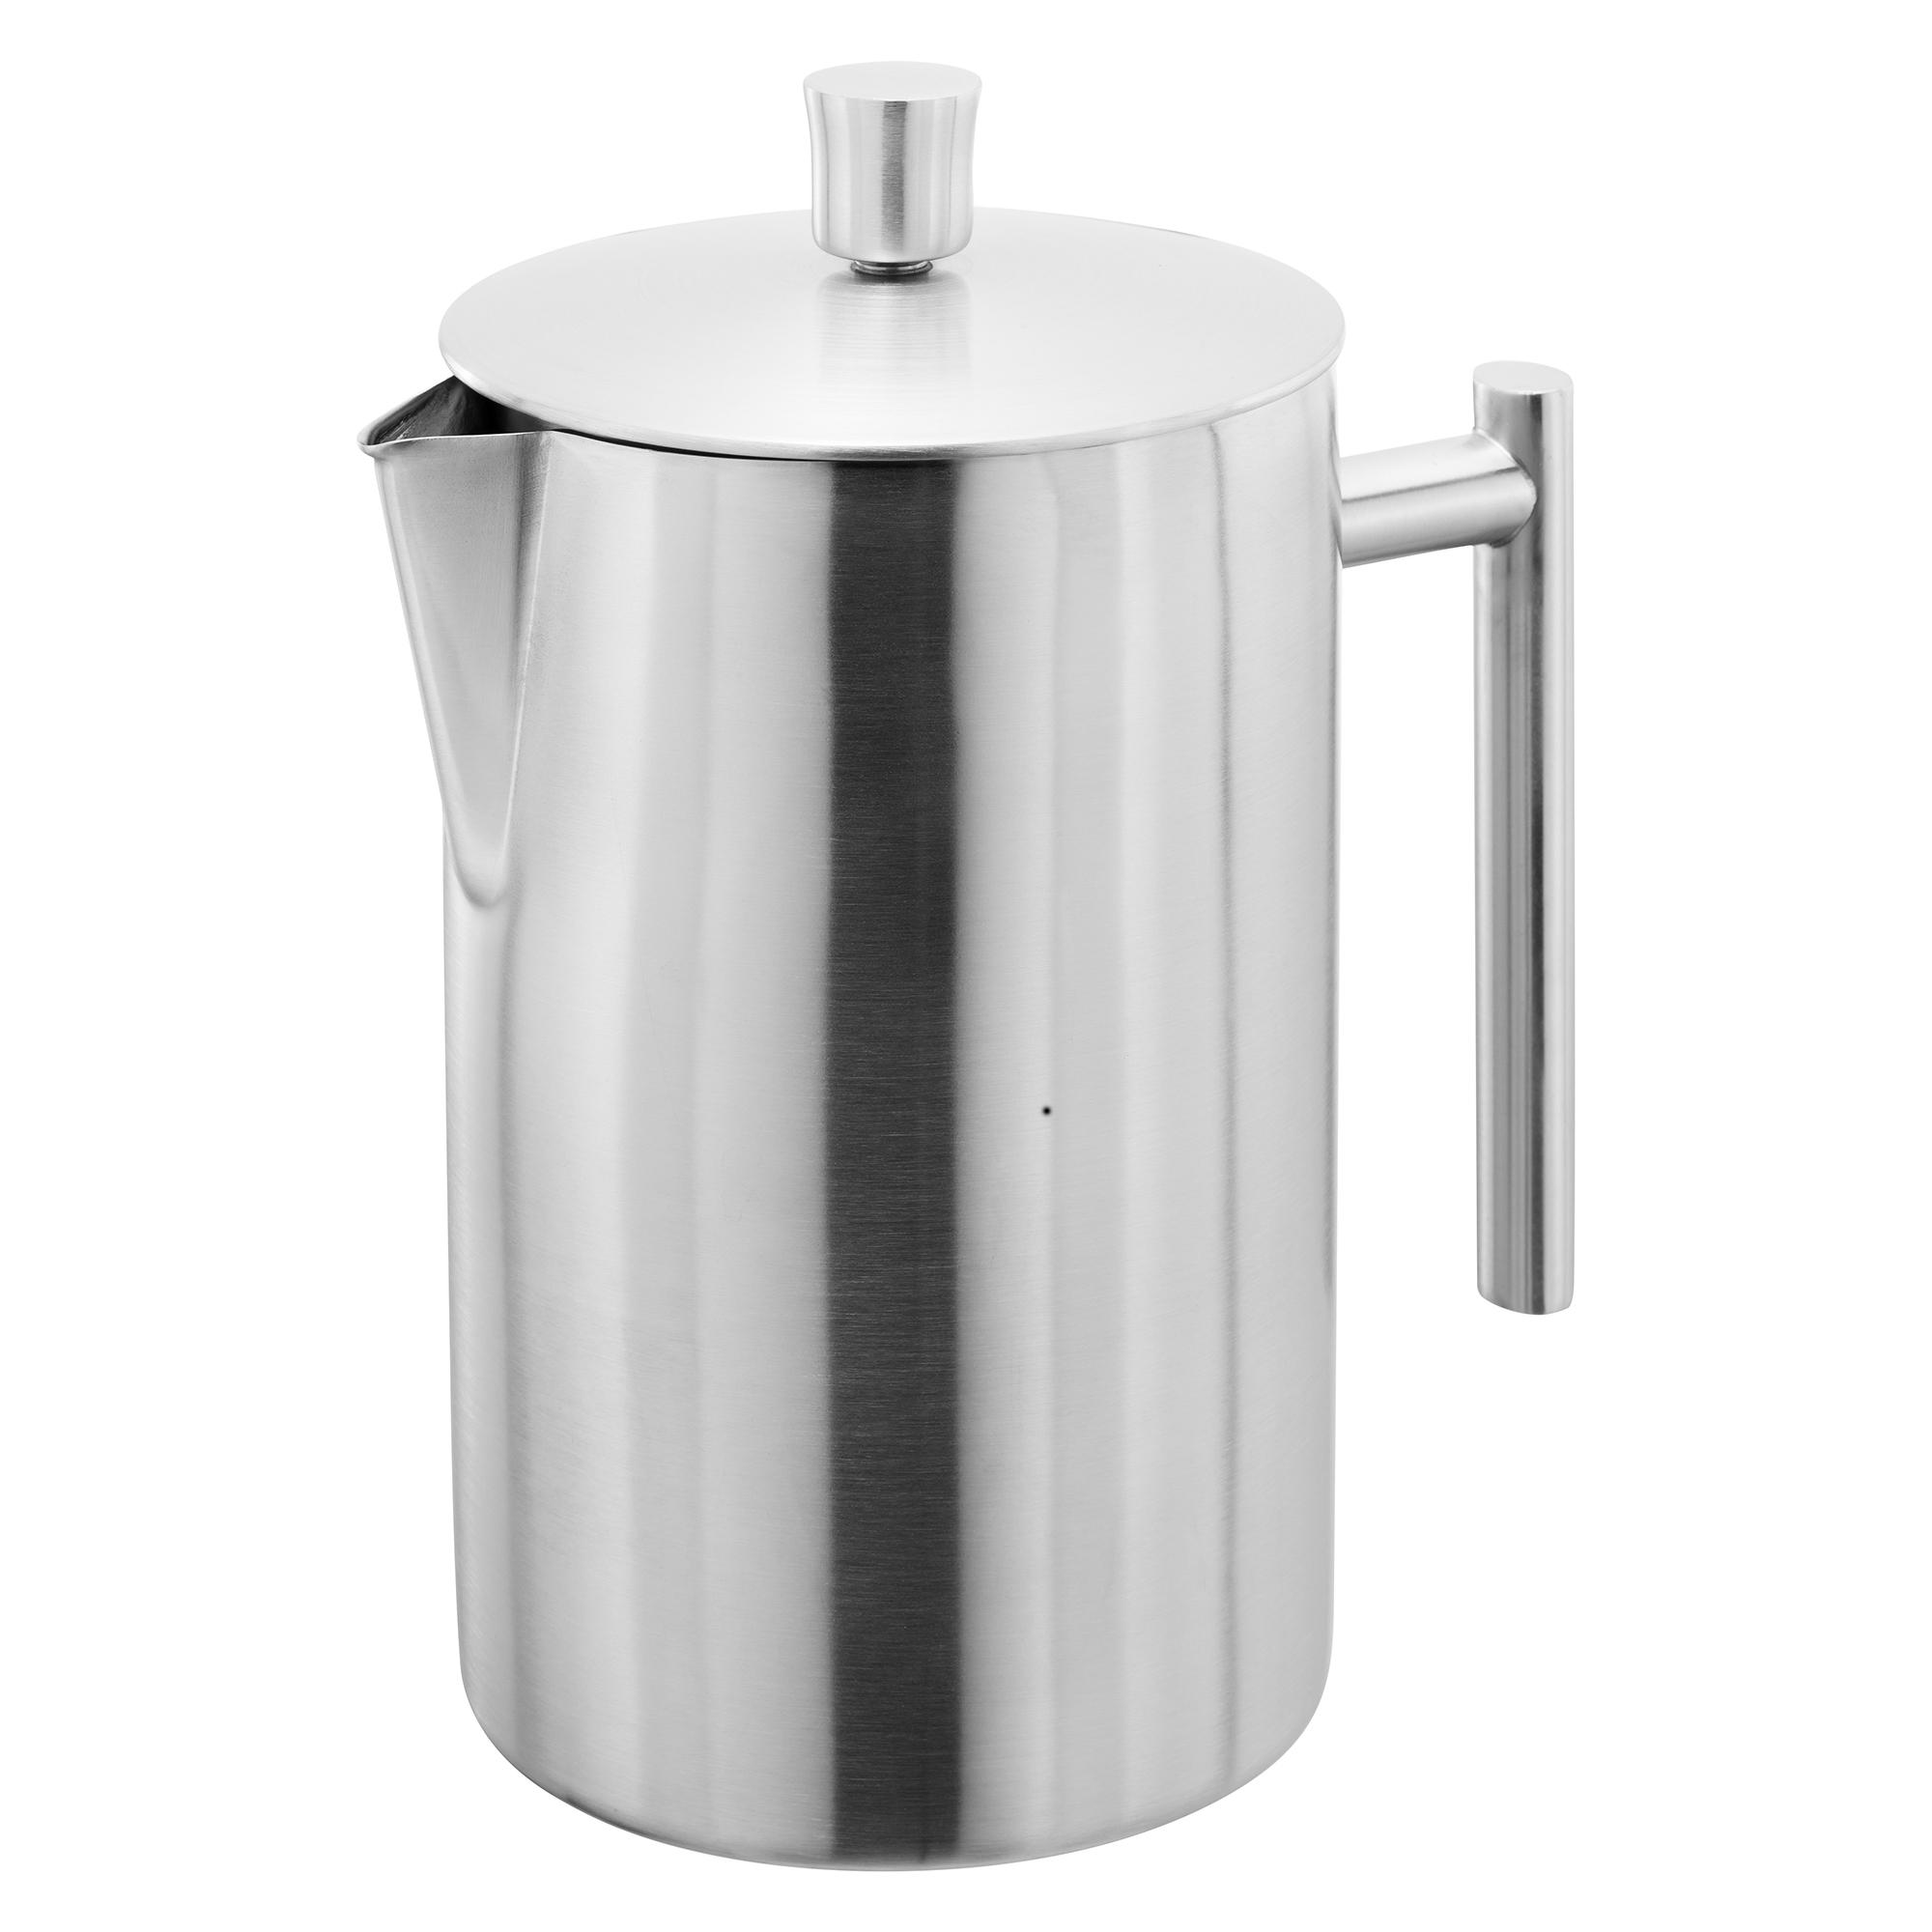 Cafetiere stempelkande mat stål 12 kopper